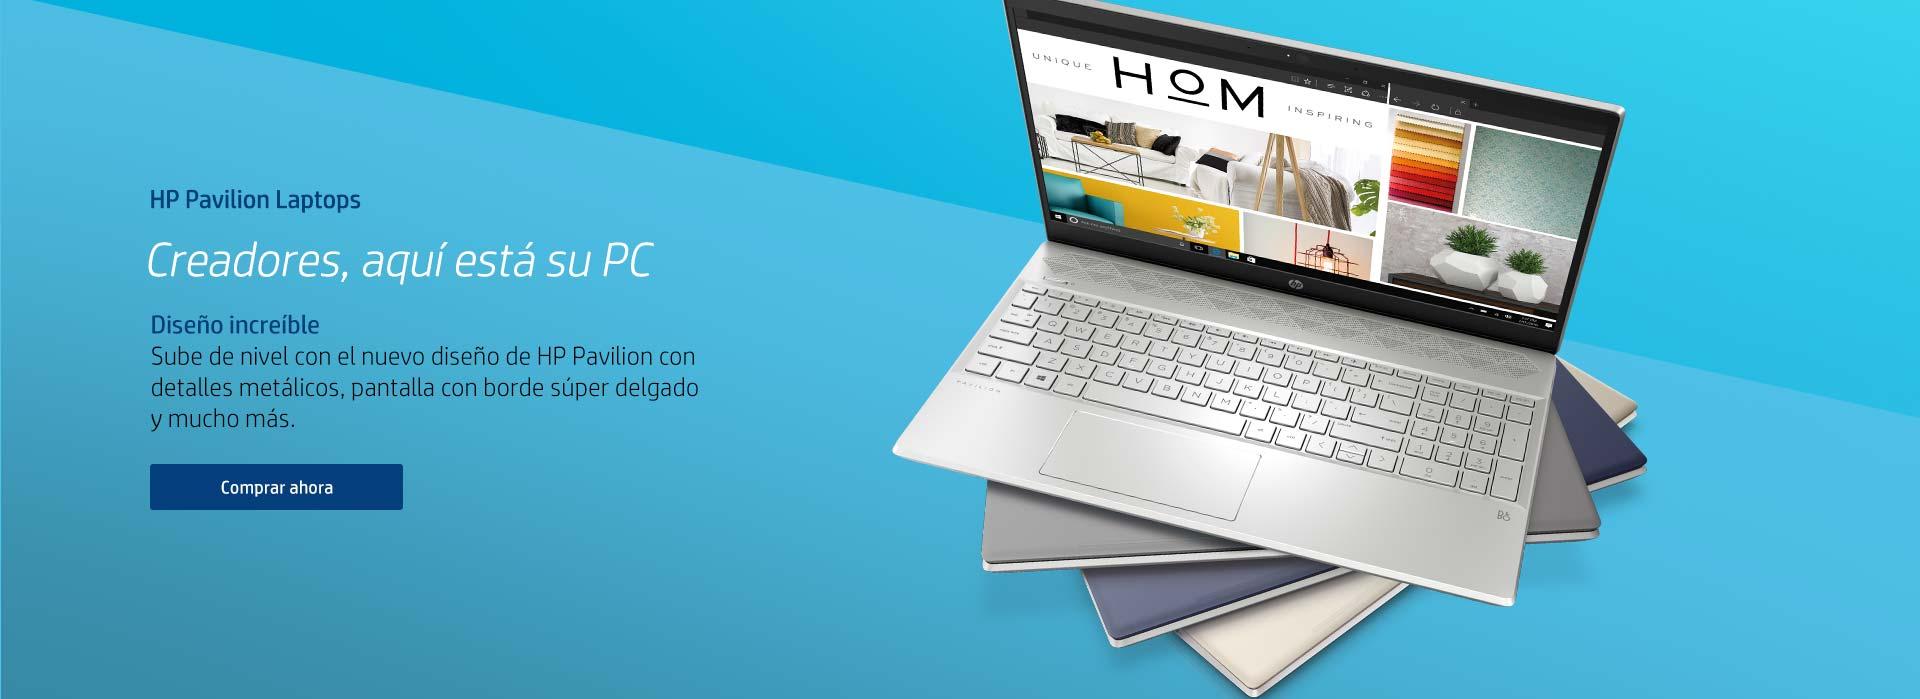 HP Pavilion Notebooks | Creadores, aquí está su PC